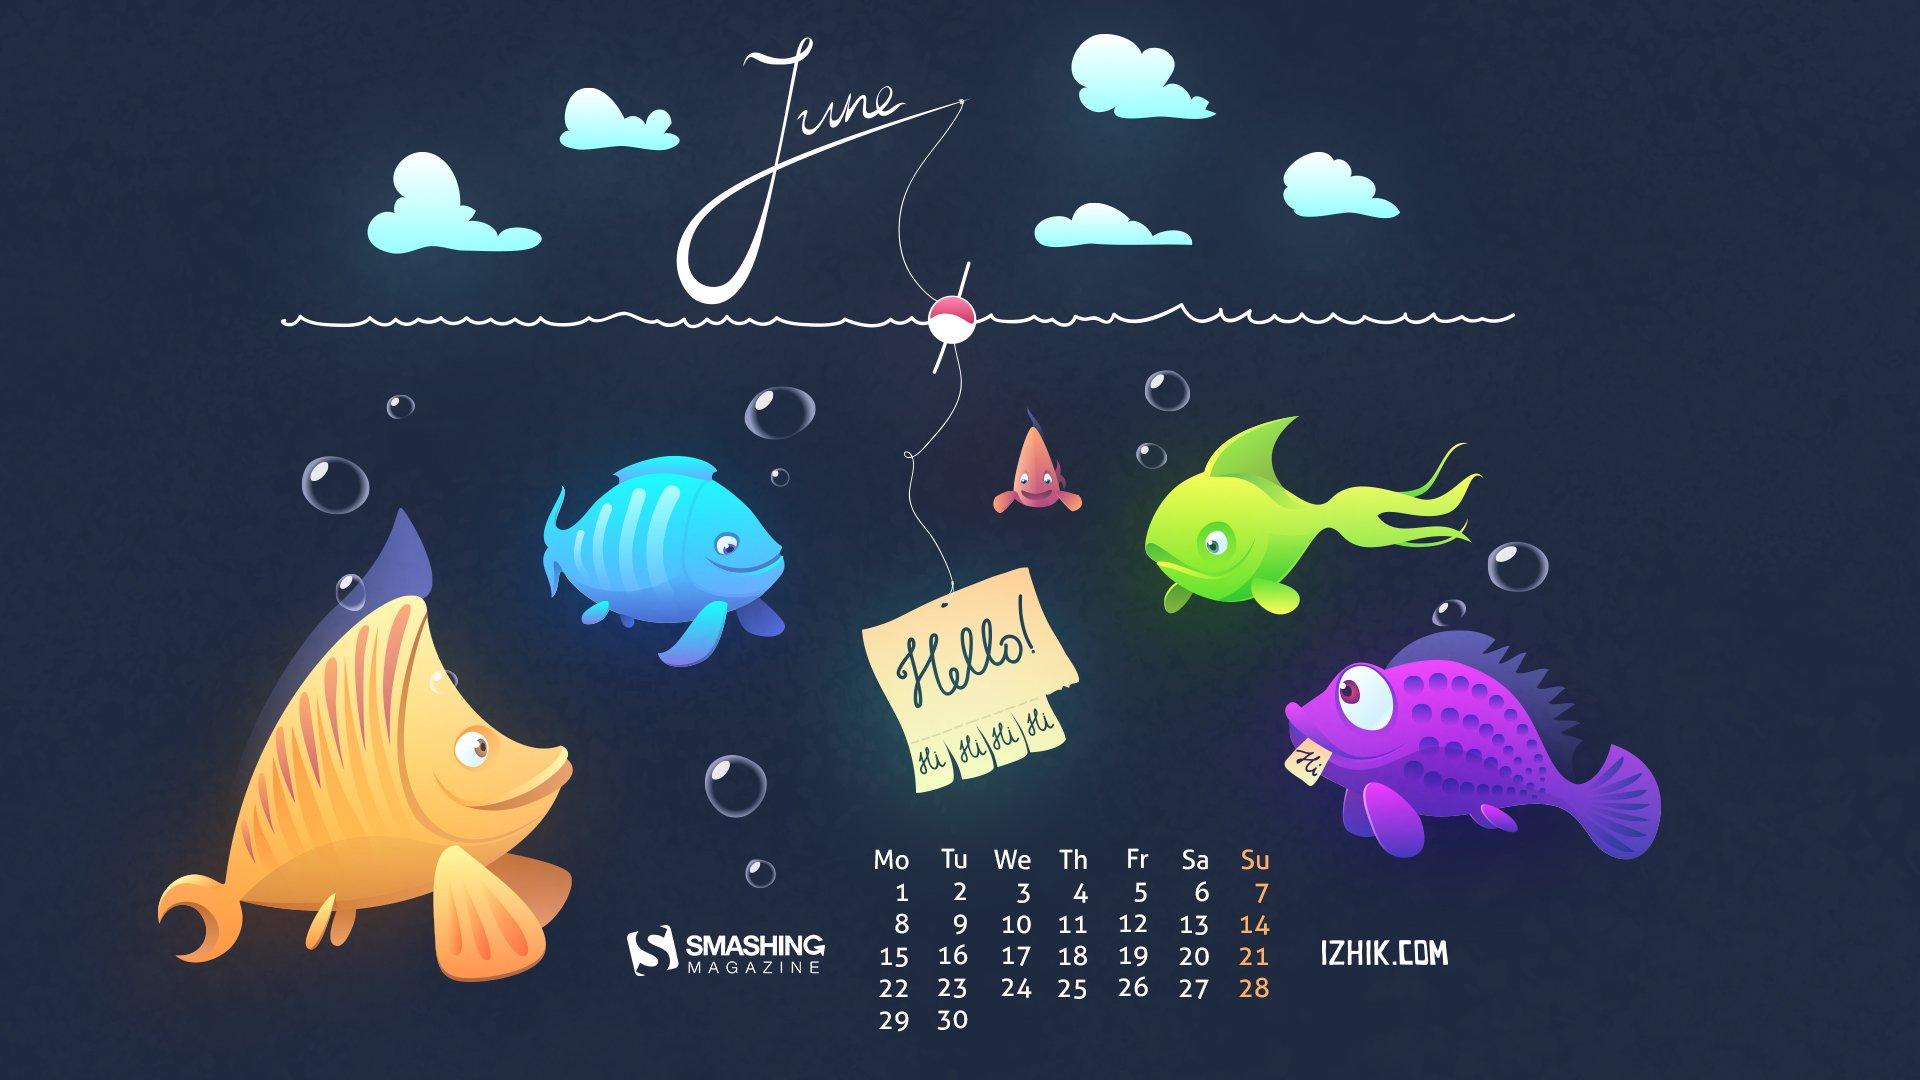 Desktop Wallpaper Calendars June 2015 Smashing Magazine 1920x1080